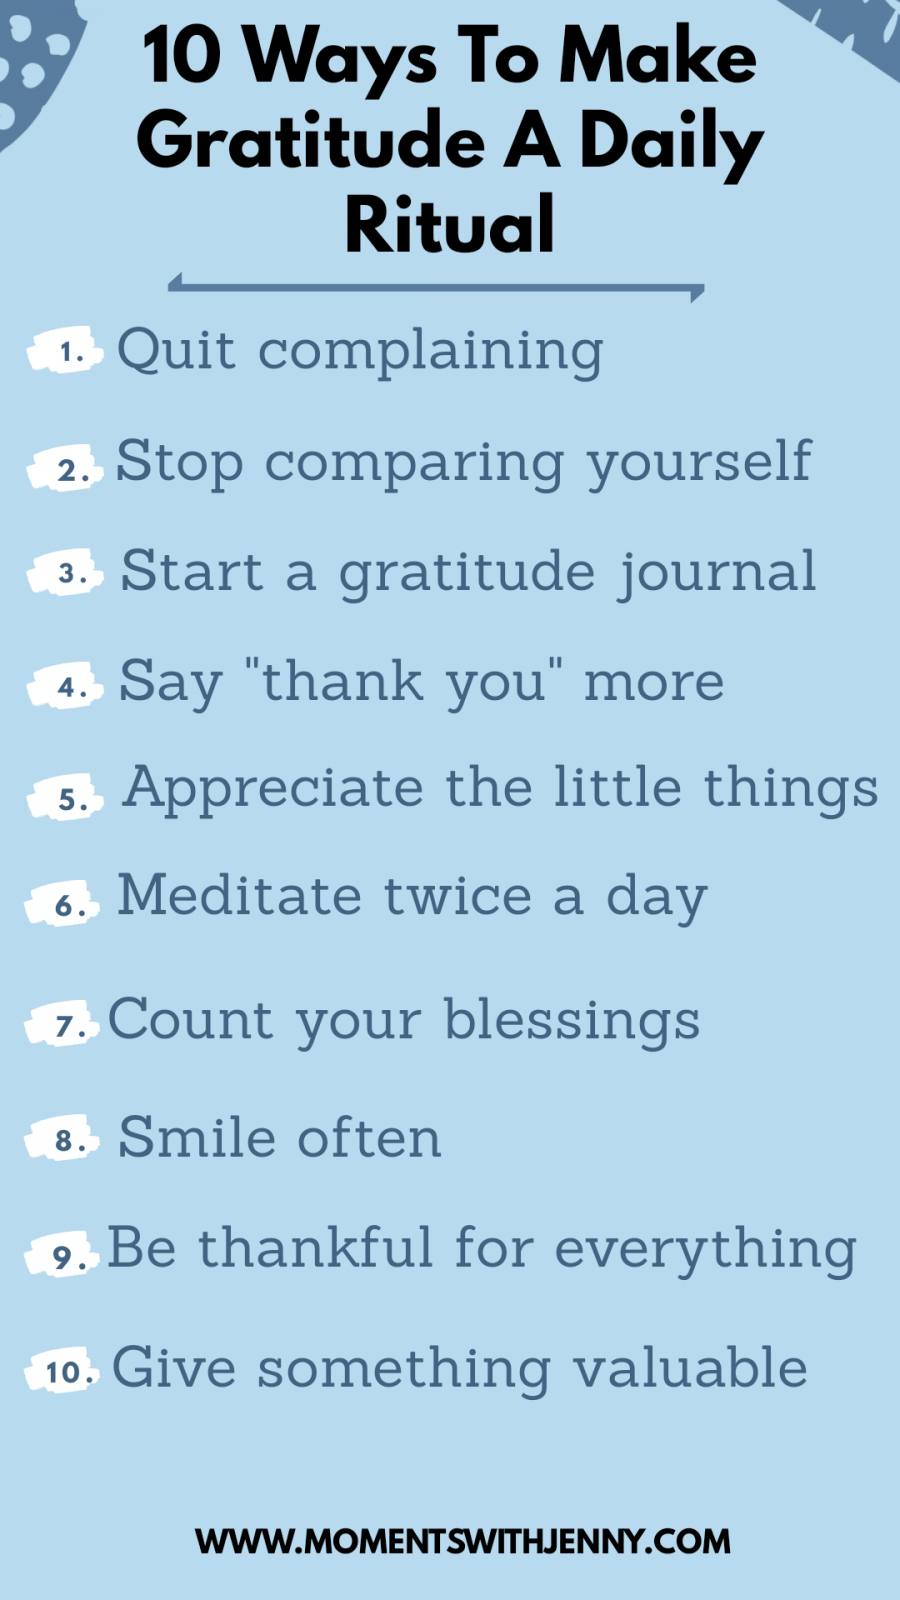 How to make gratitude a daily habit